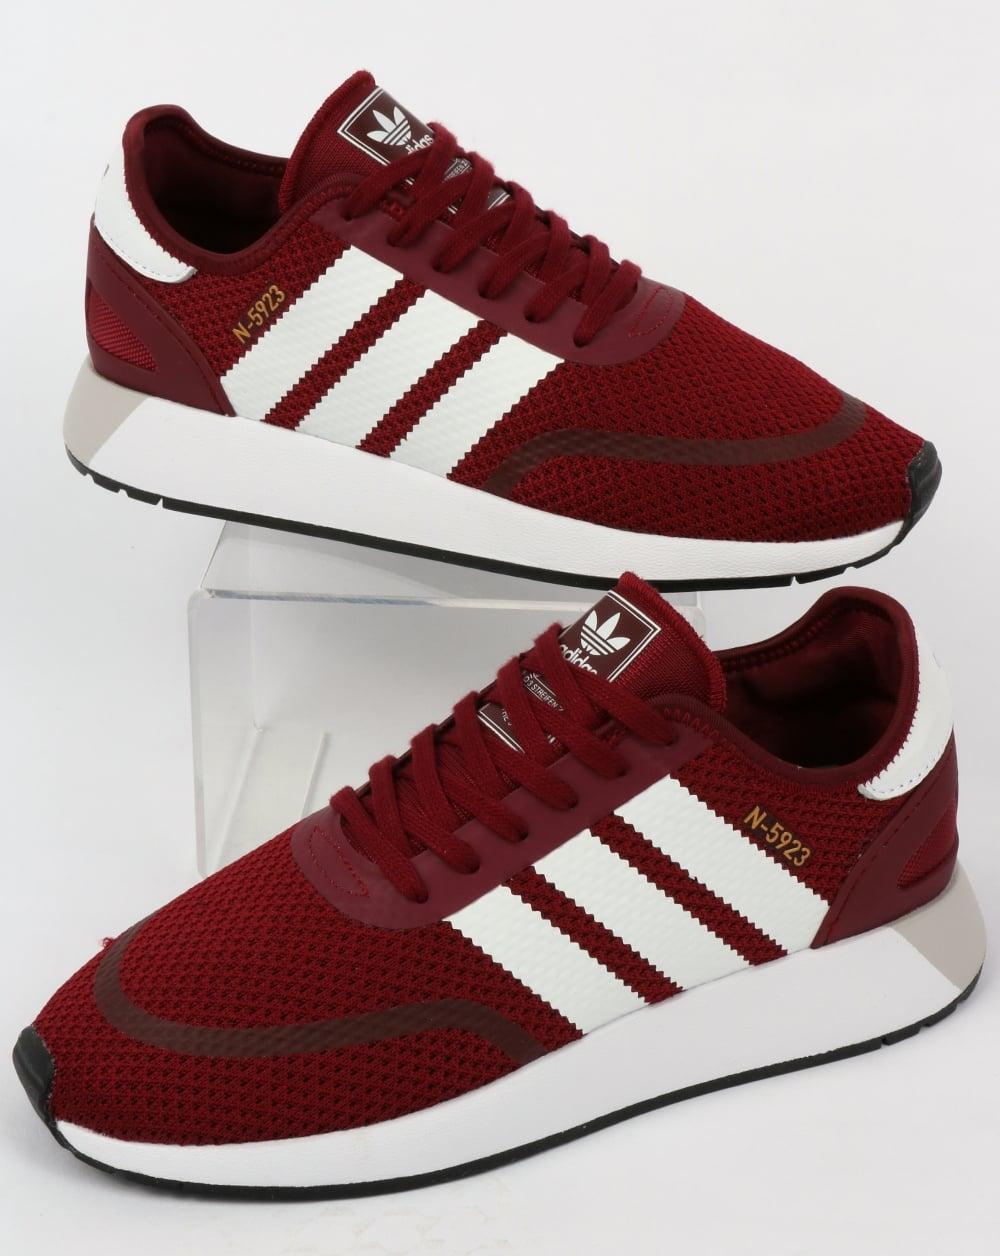 adidas womens shoes burgundy off 50% skolanlar.nu